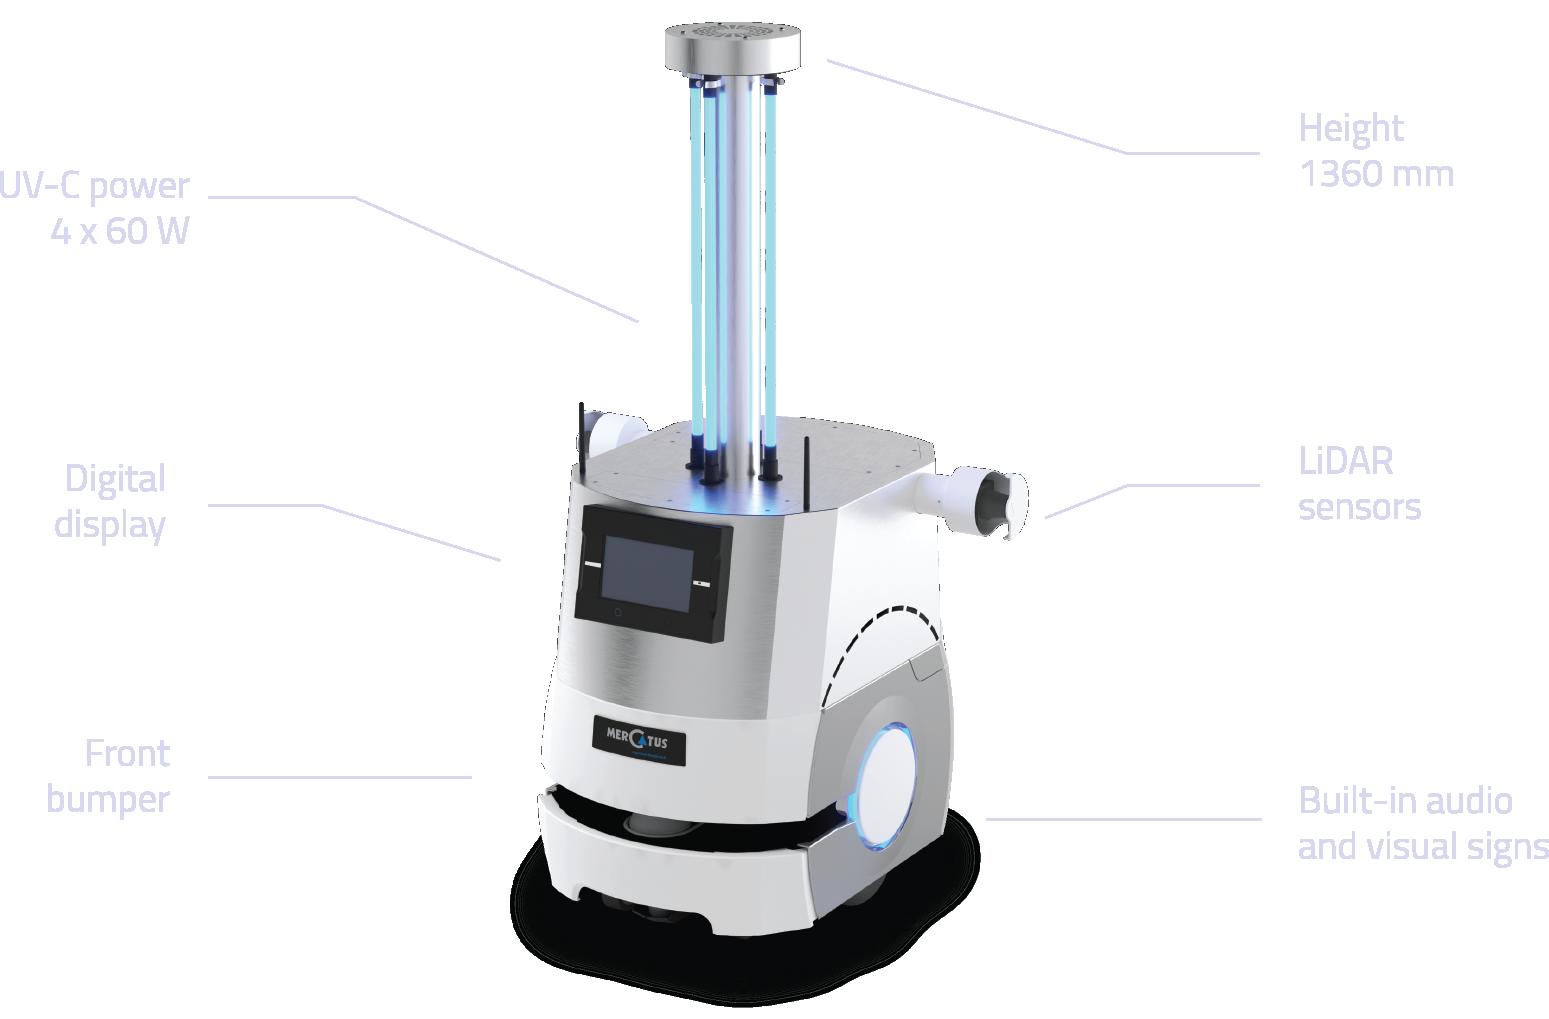 Mercatus_WonderXRobot_UVC_Light_Disinfection_Bacteria_Covid19_Product_Features-10